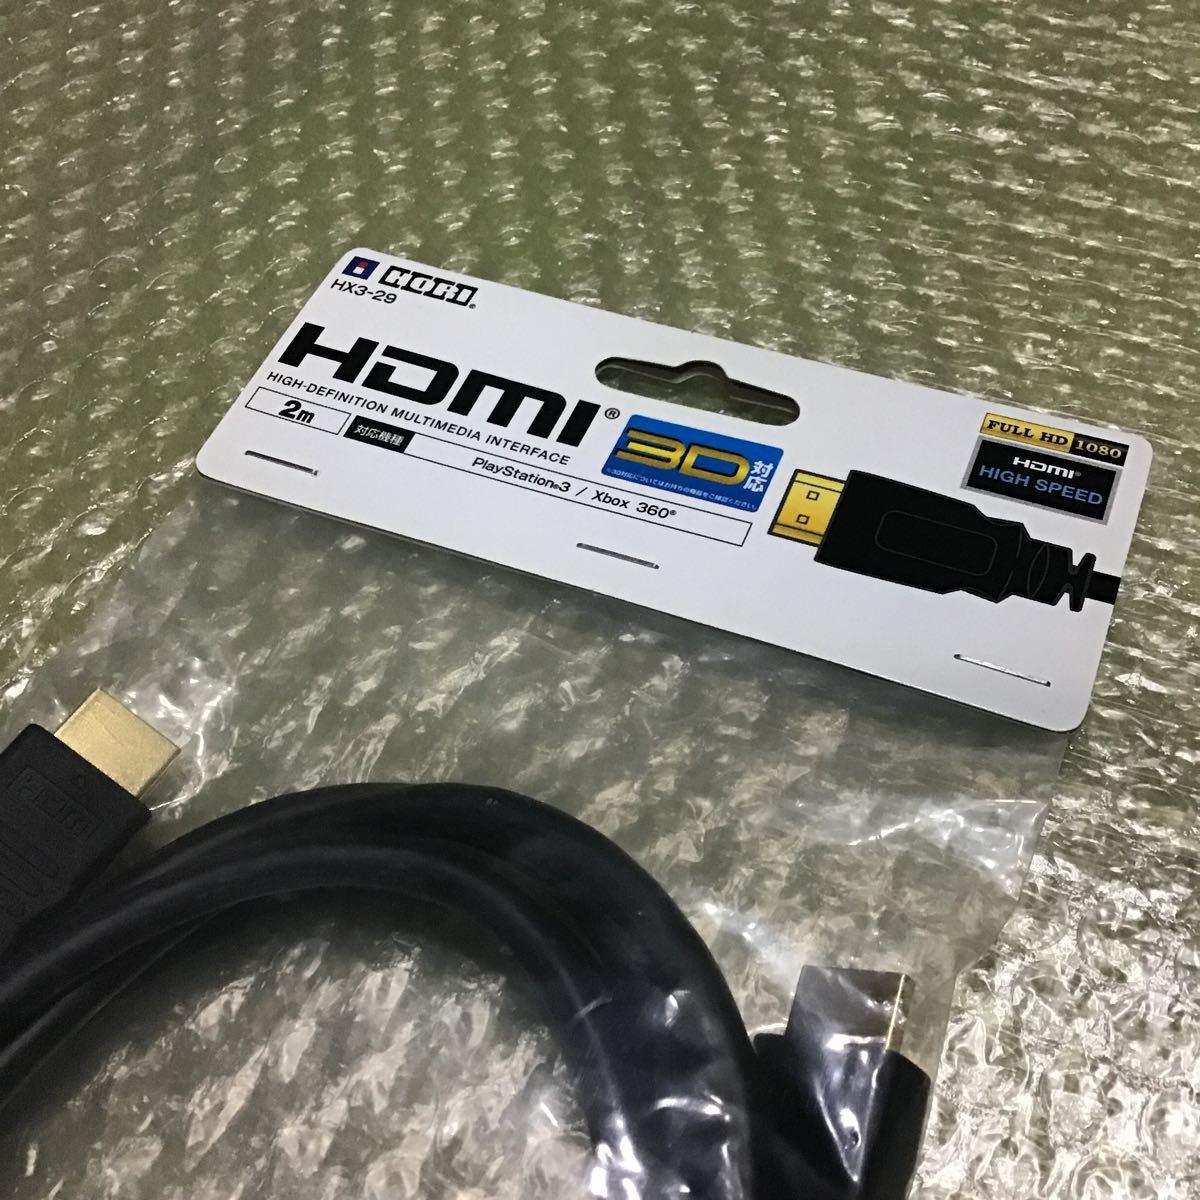 HORI HDMIケーブル HX3-29 2,0m ニンテンドースイッチ PlayStation4 プレステ5 プレイステーション